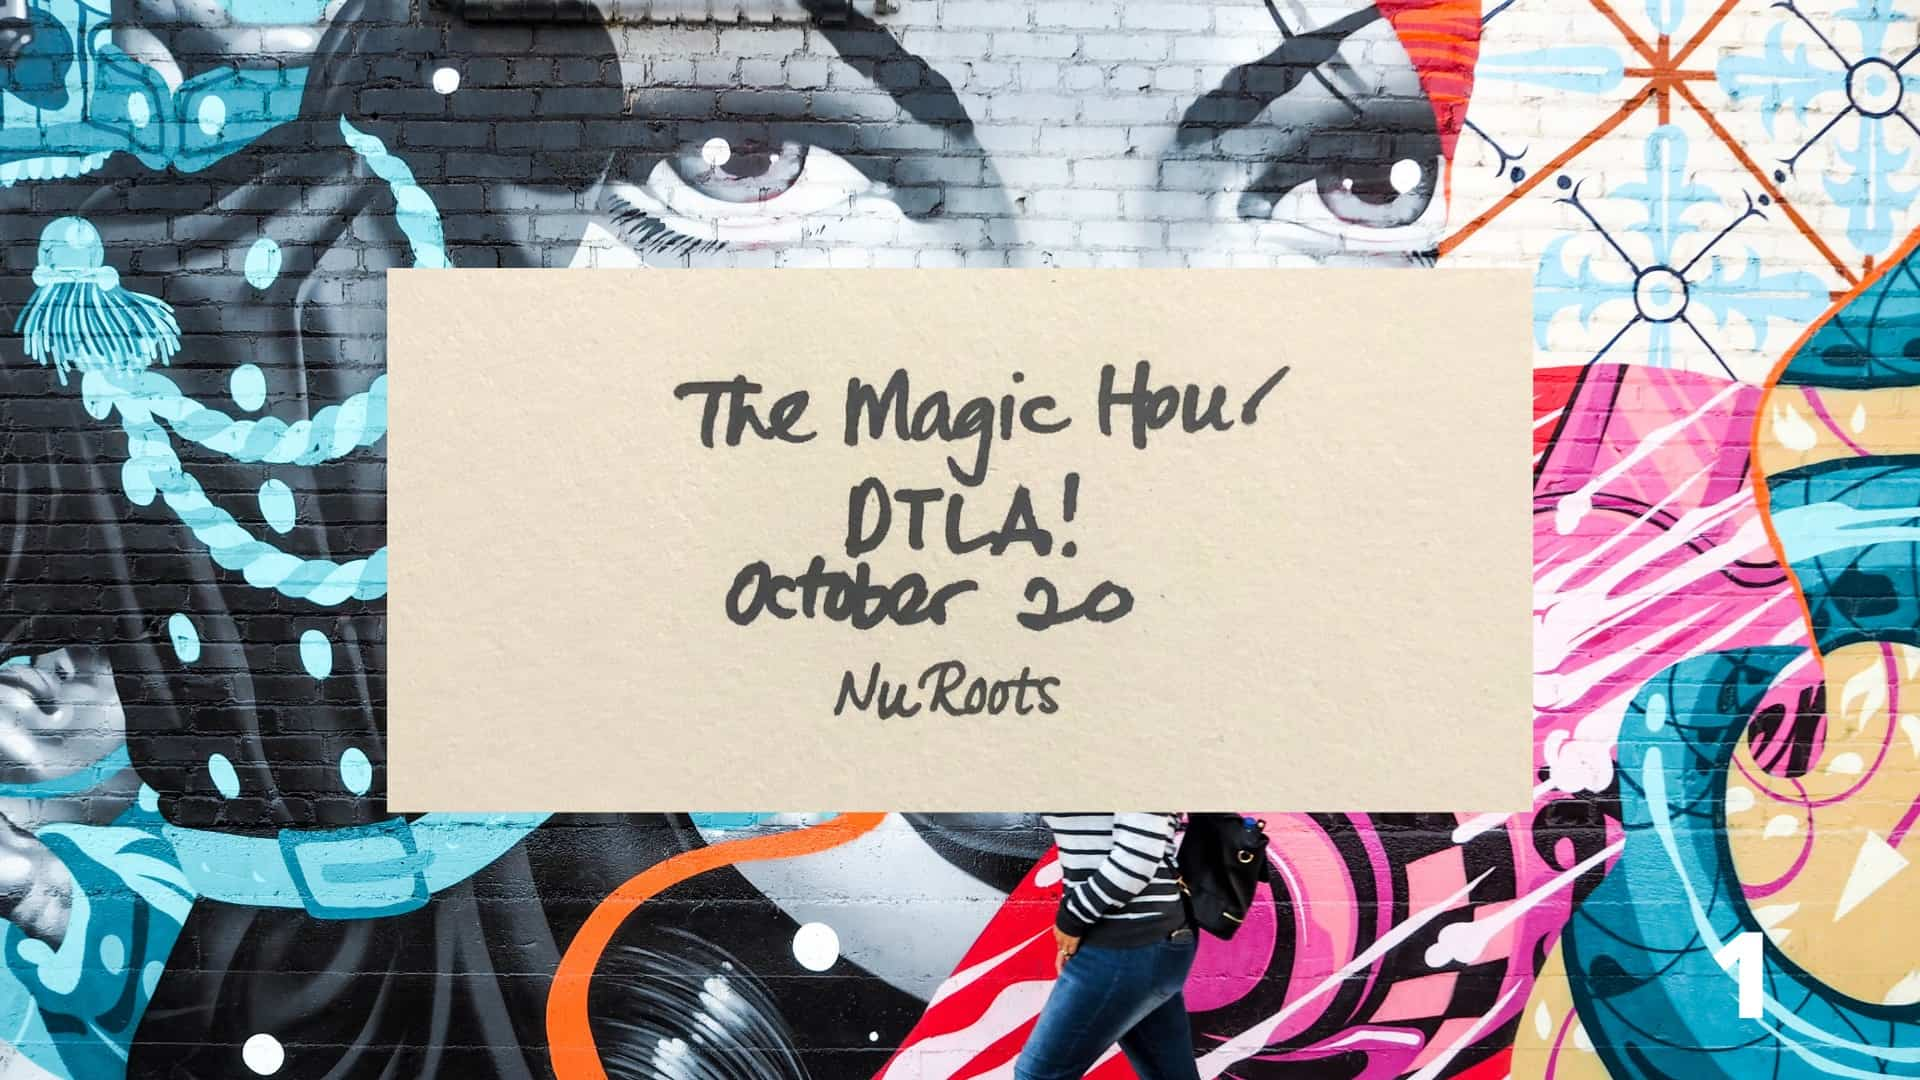 The Magic Hour: DTLA!